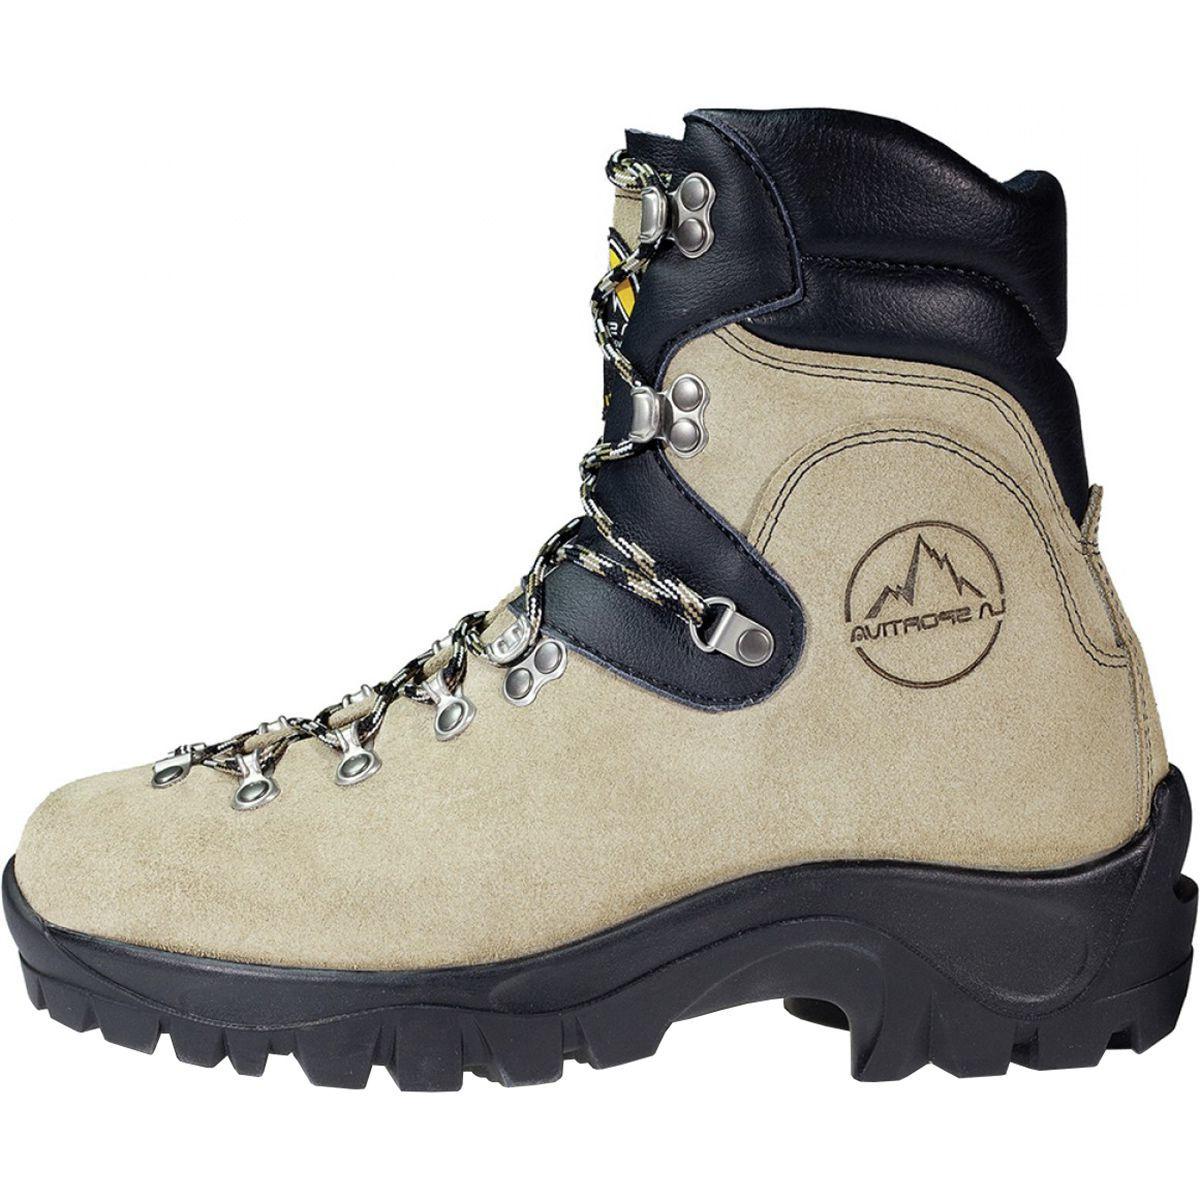 La Sportiva Glacier WLF Mountaineering Boot - Men's